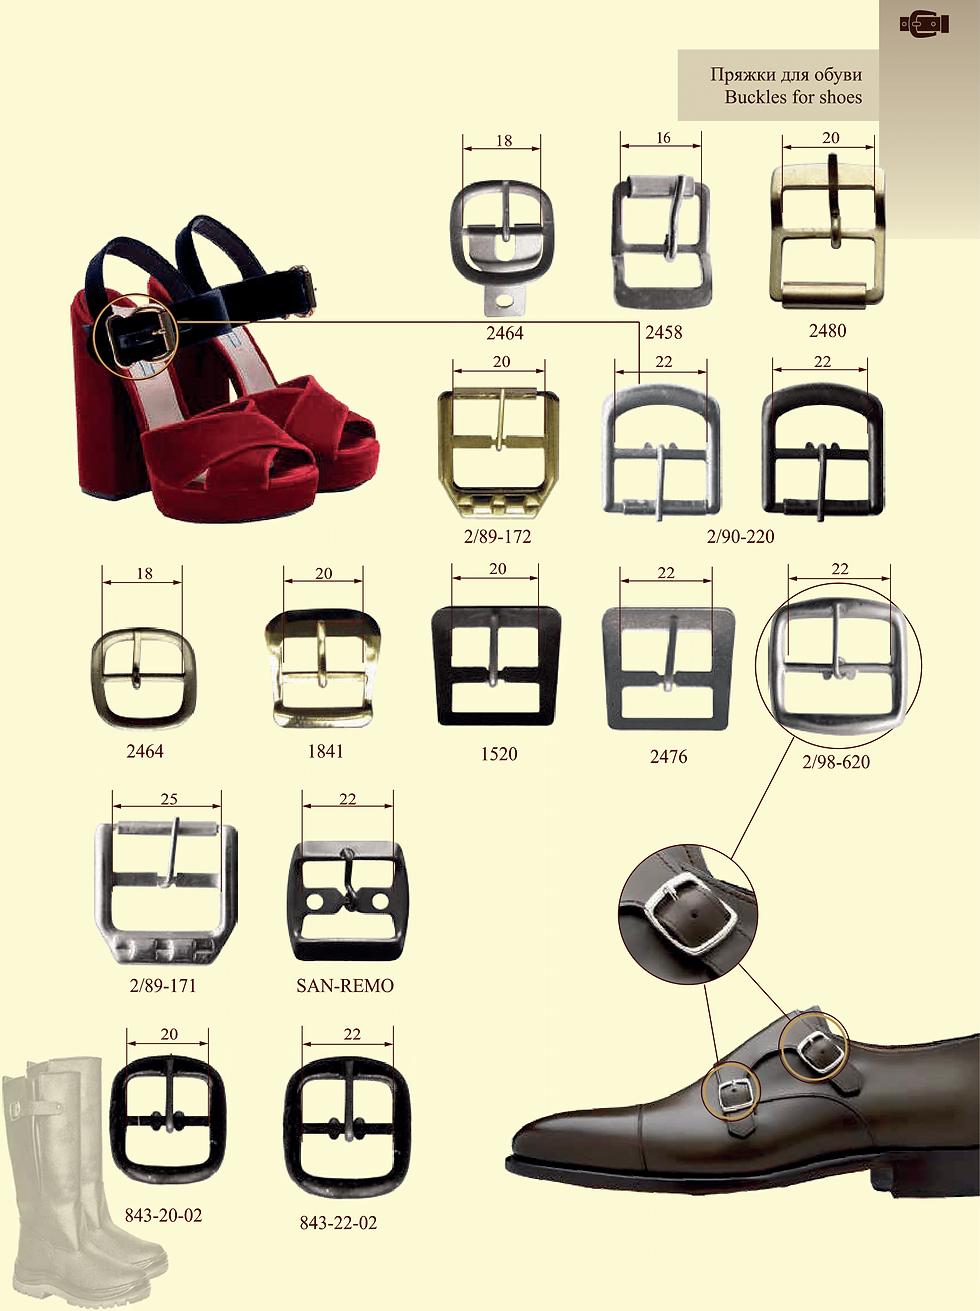 пряжки для обуви